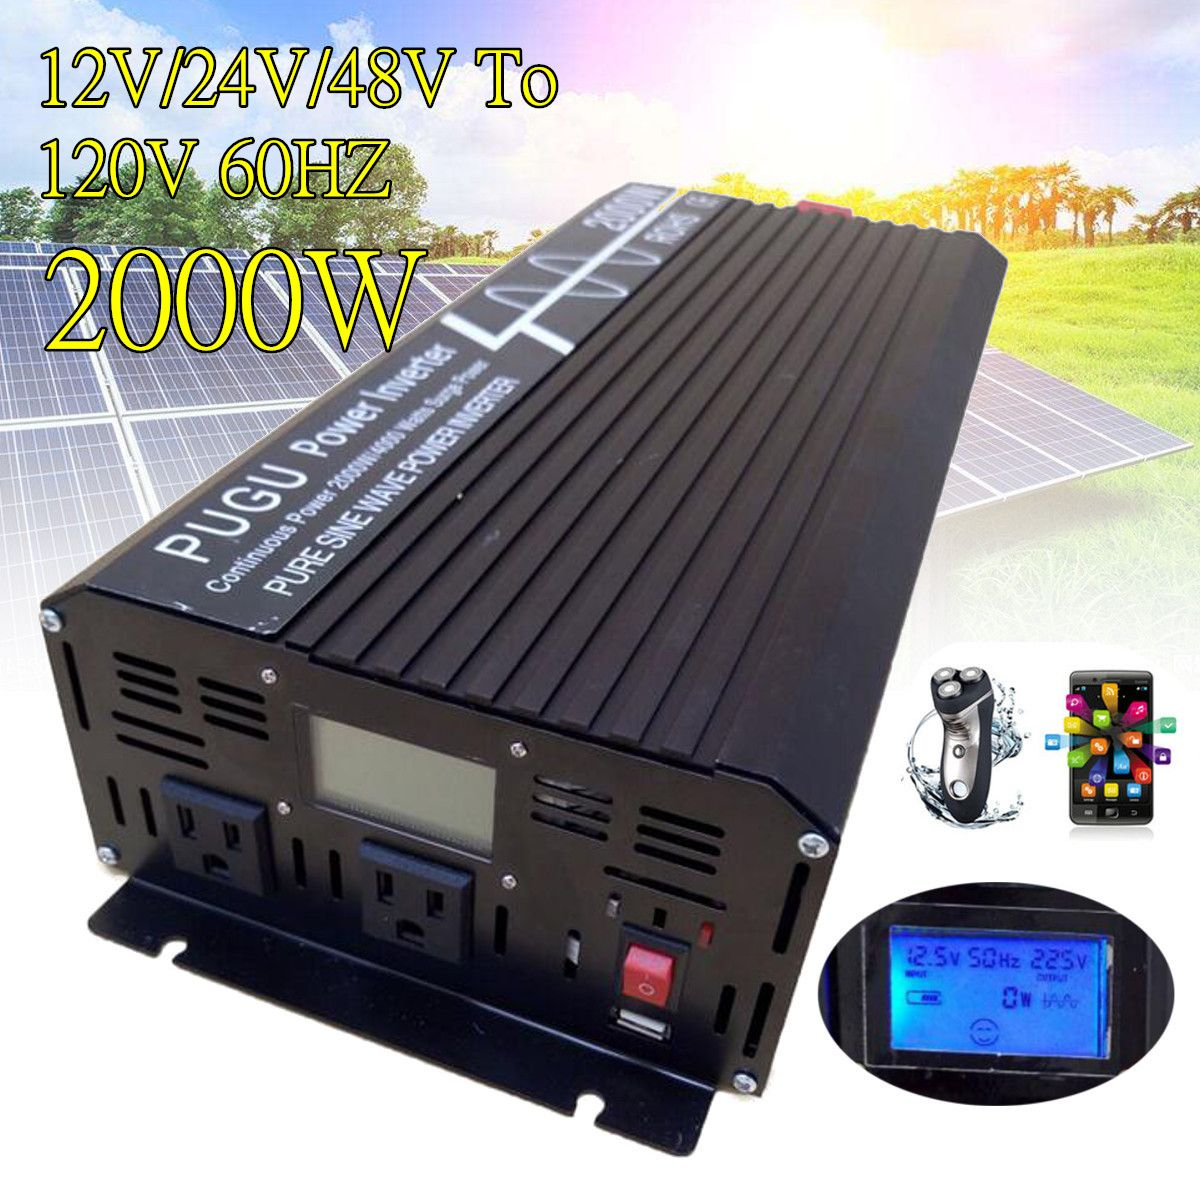 2000W Car Pure Sine Wave DC to AC Power Inverter P eak 4000W 12V/24V/48V to 120V/220V With LCD Display USB For Car